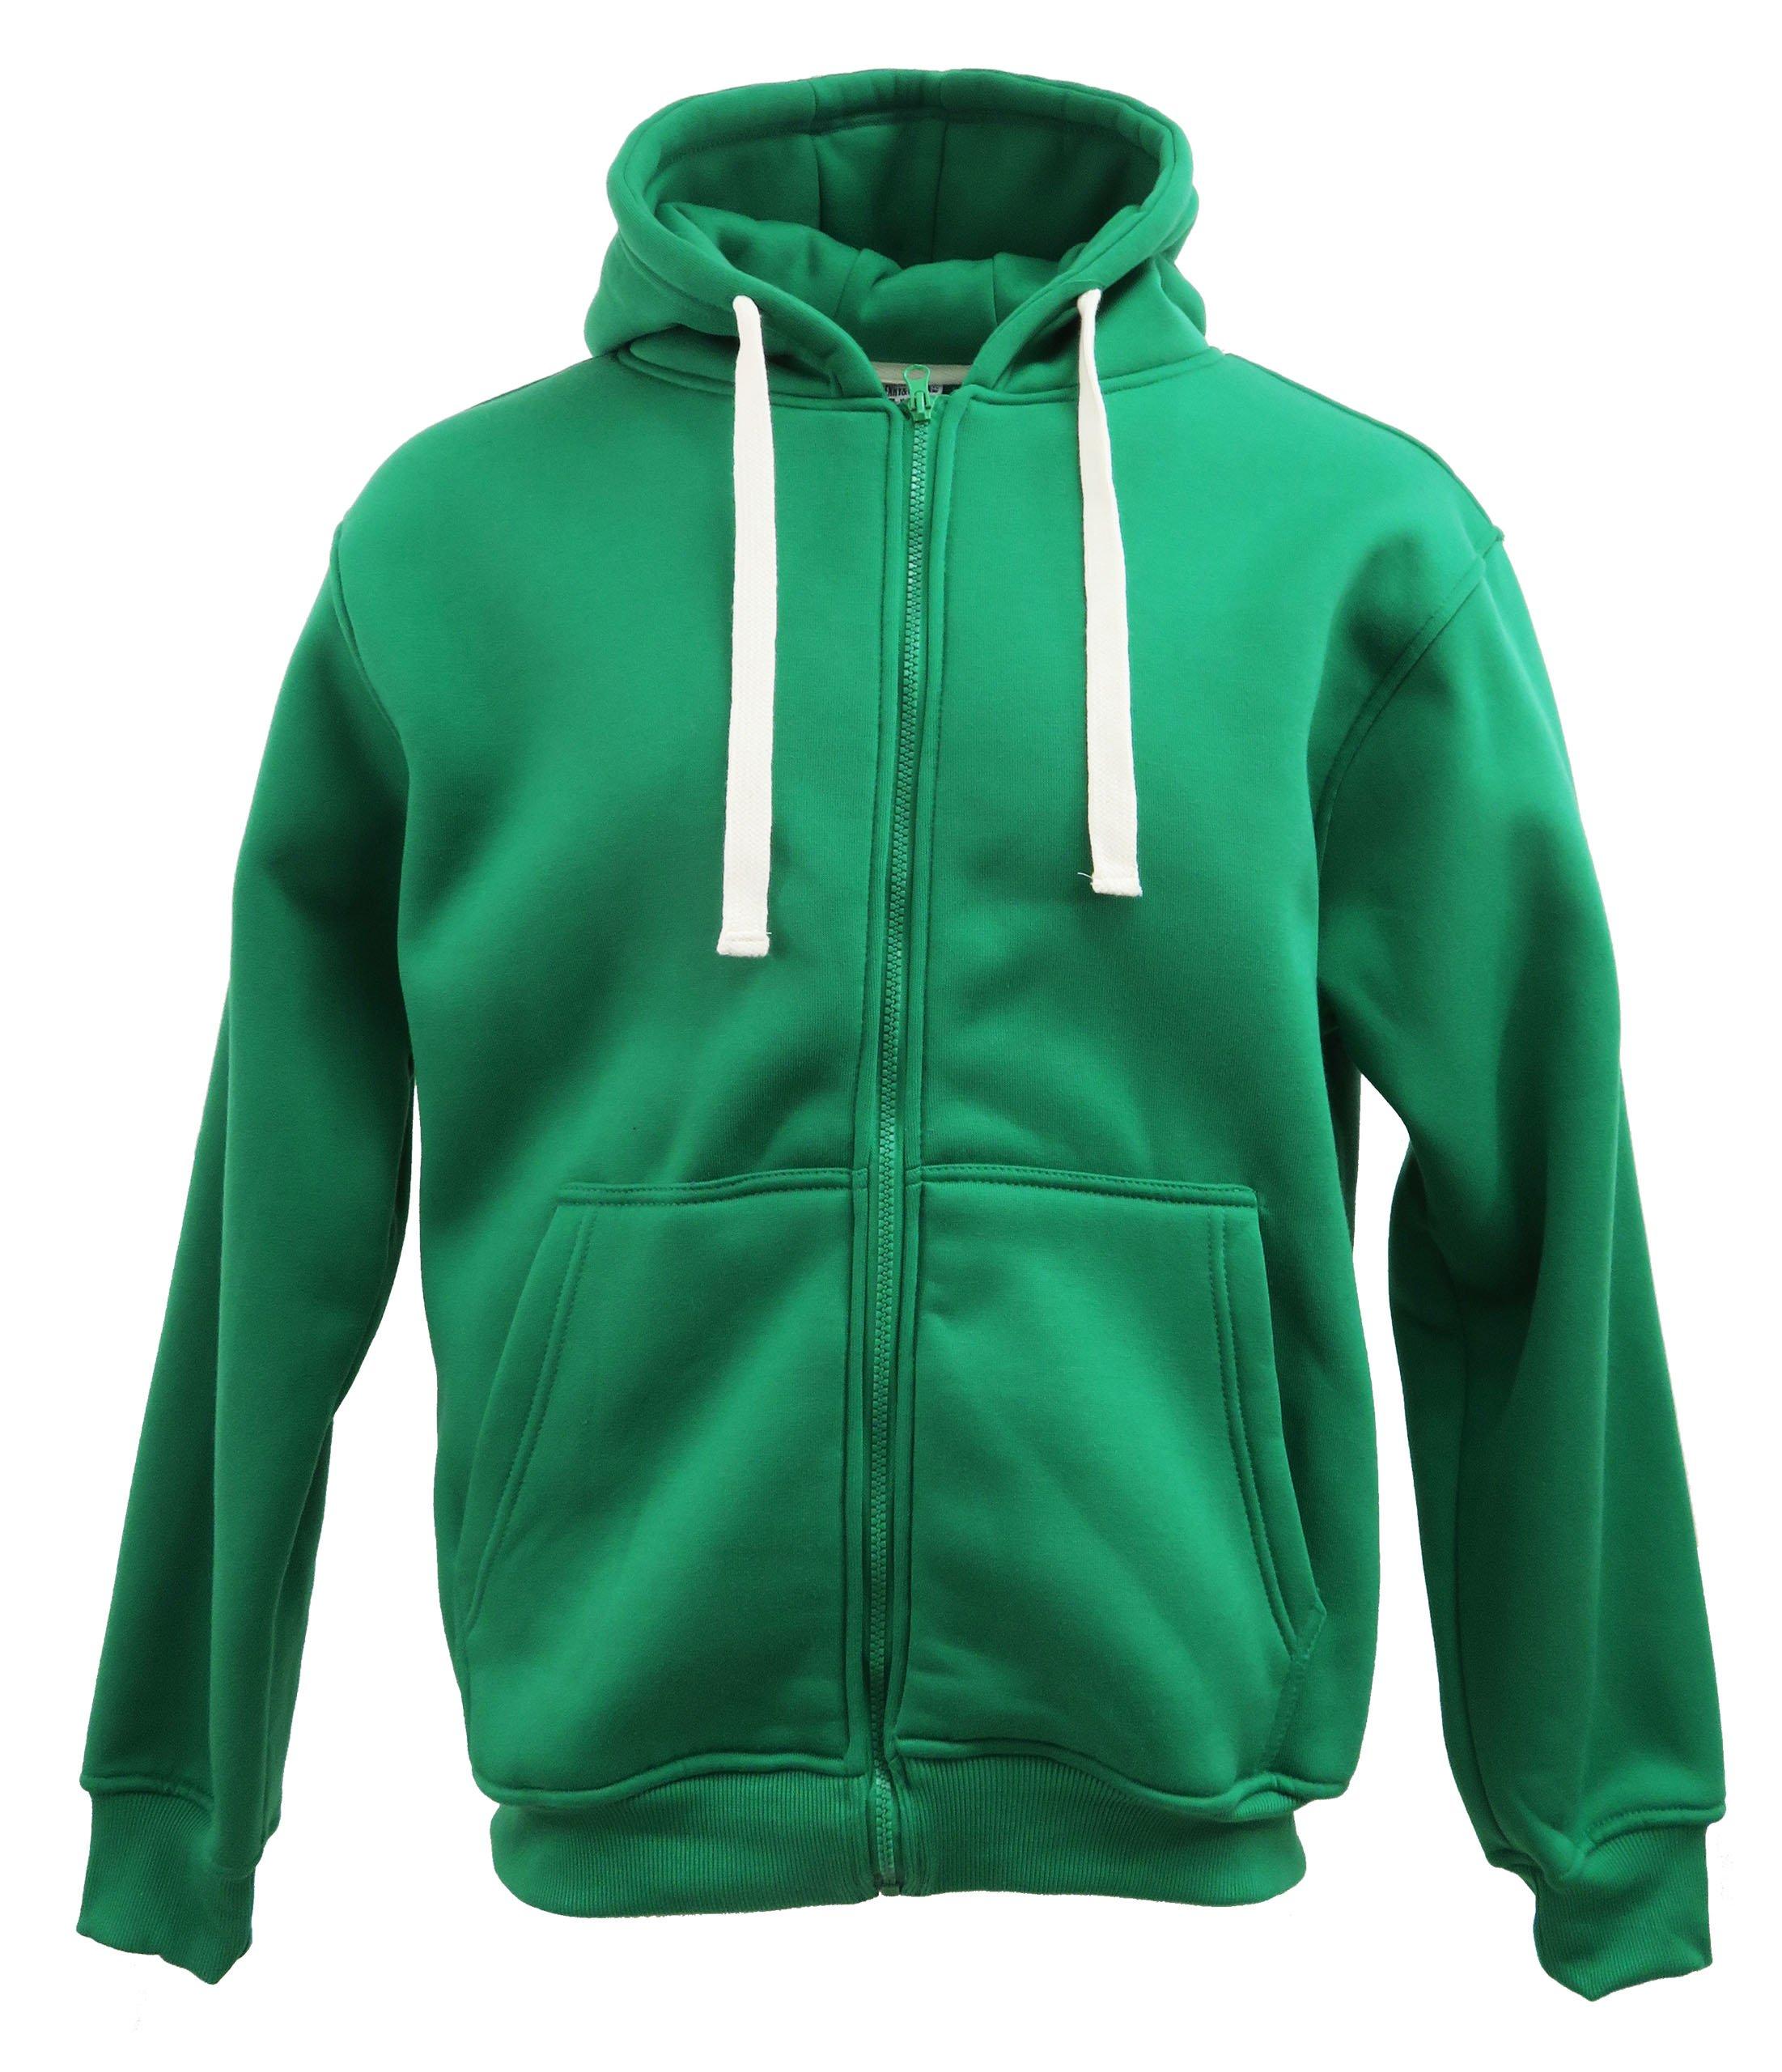 Henry & William Men's Basic Fleece Zip UP Hoody L Kelly Green